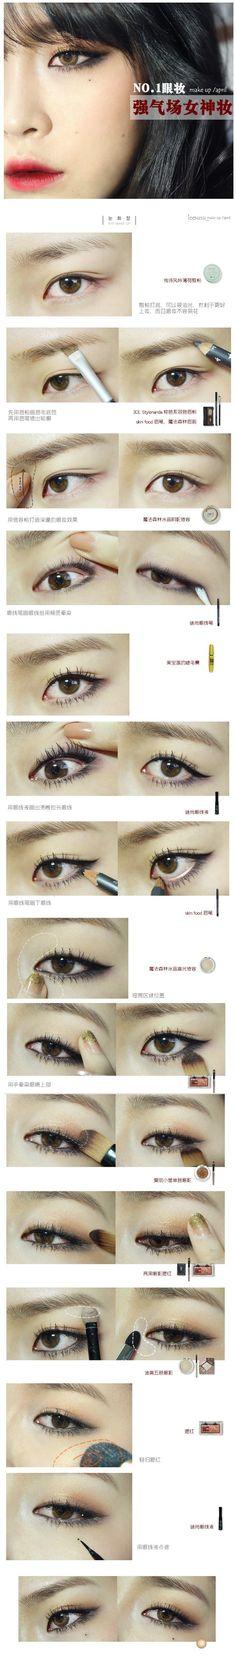 Korean make up www.SkincareInKorea.info